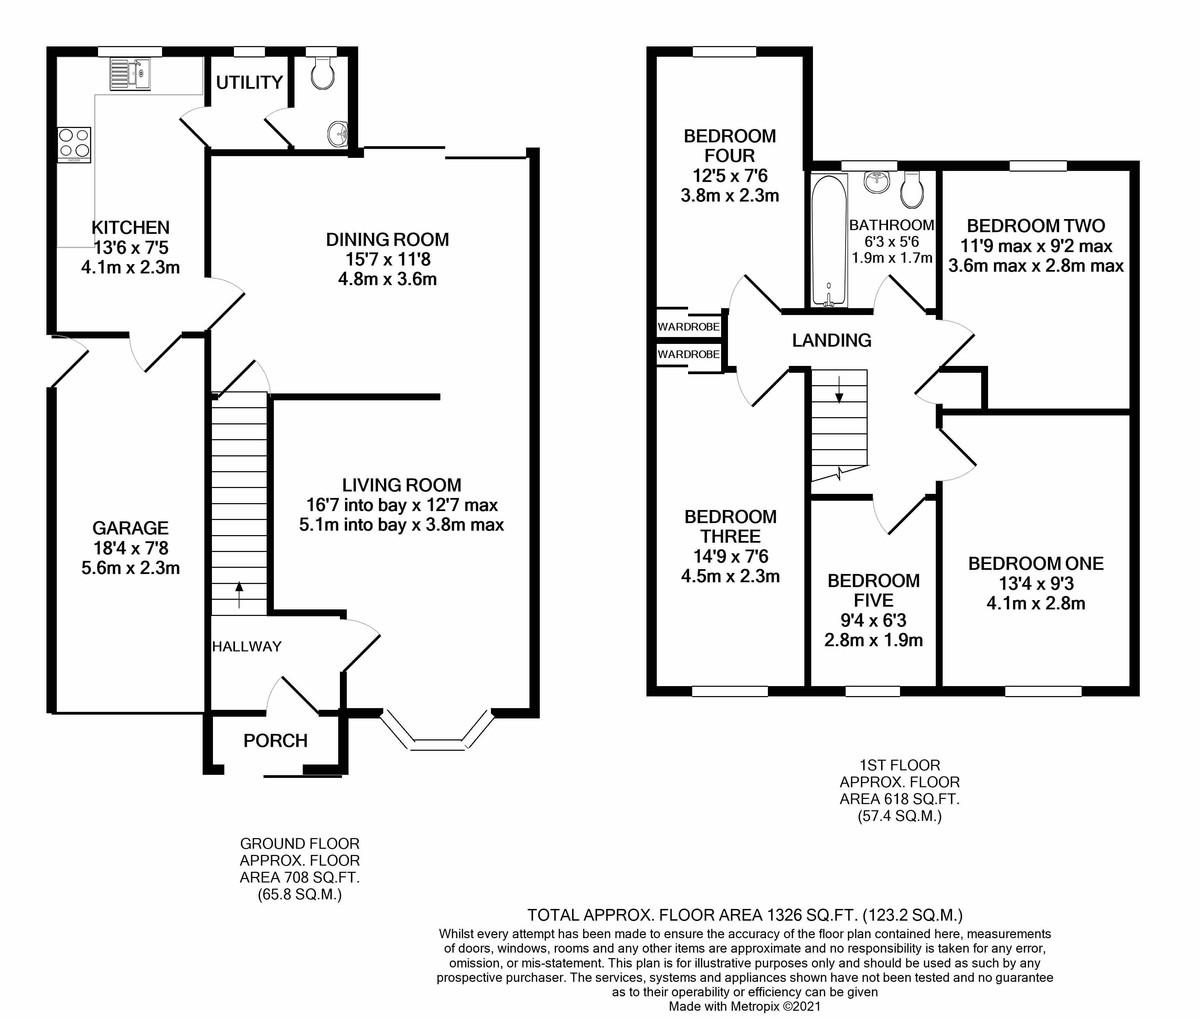 Shandon Close, Birmingham floorplan 1 of 1